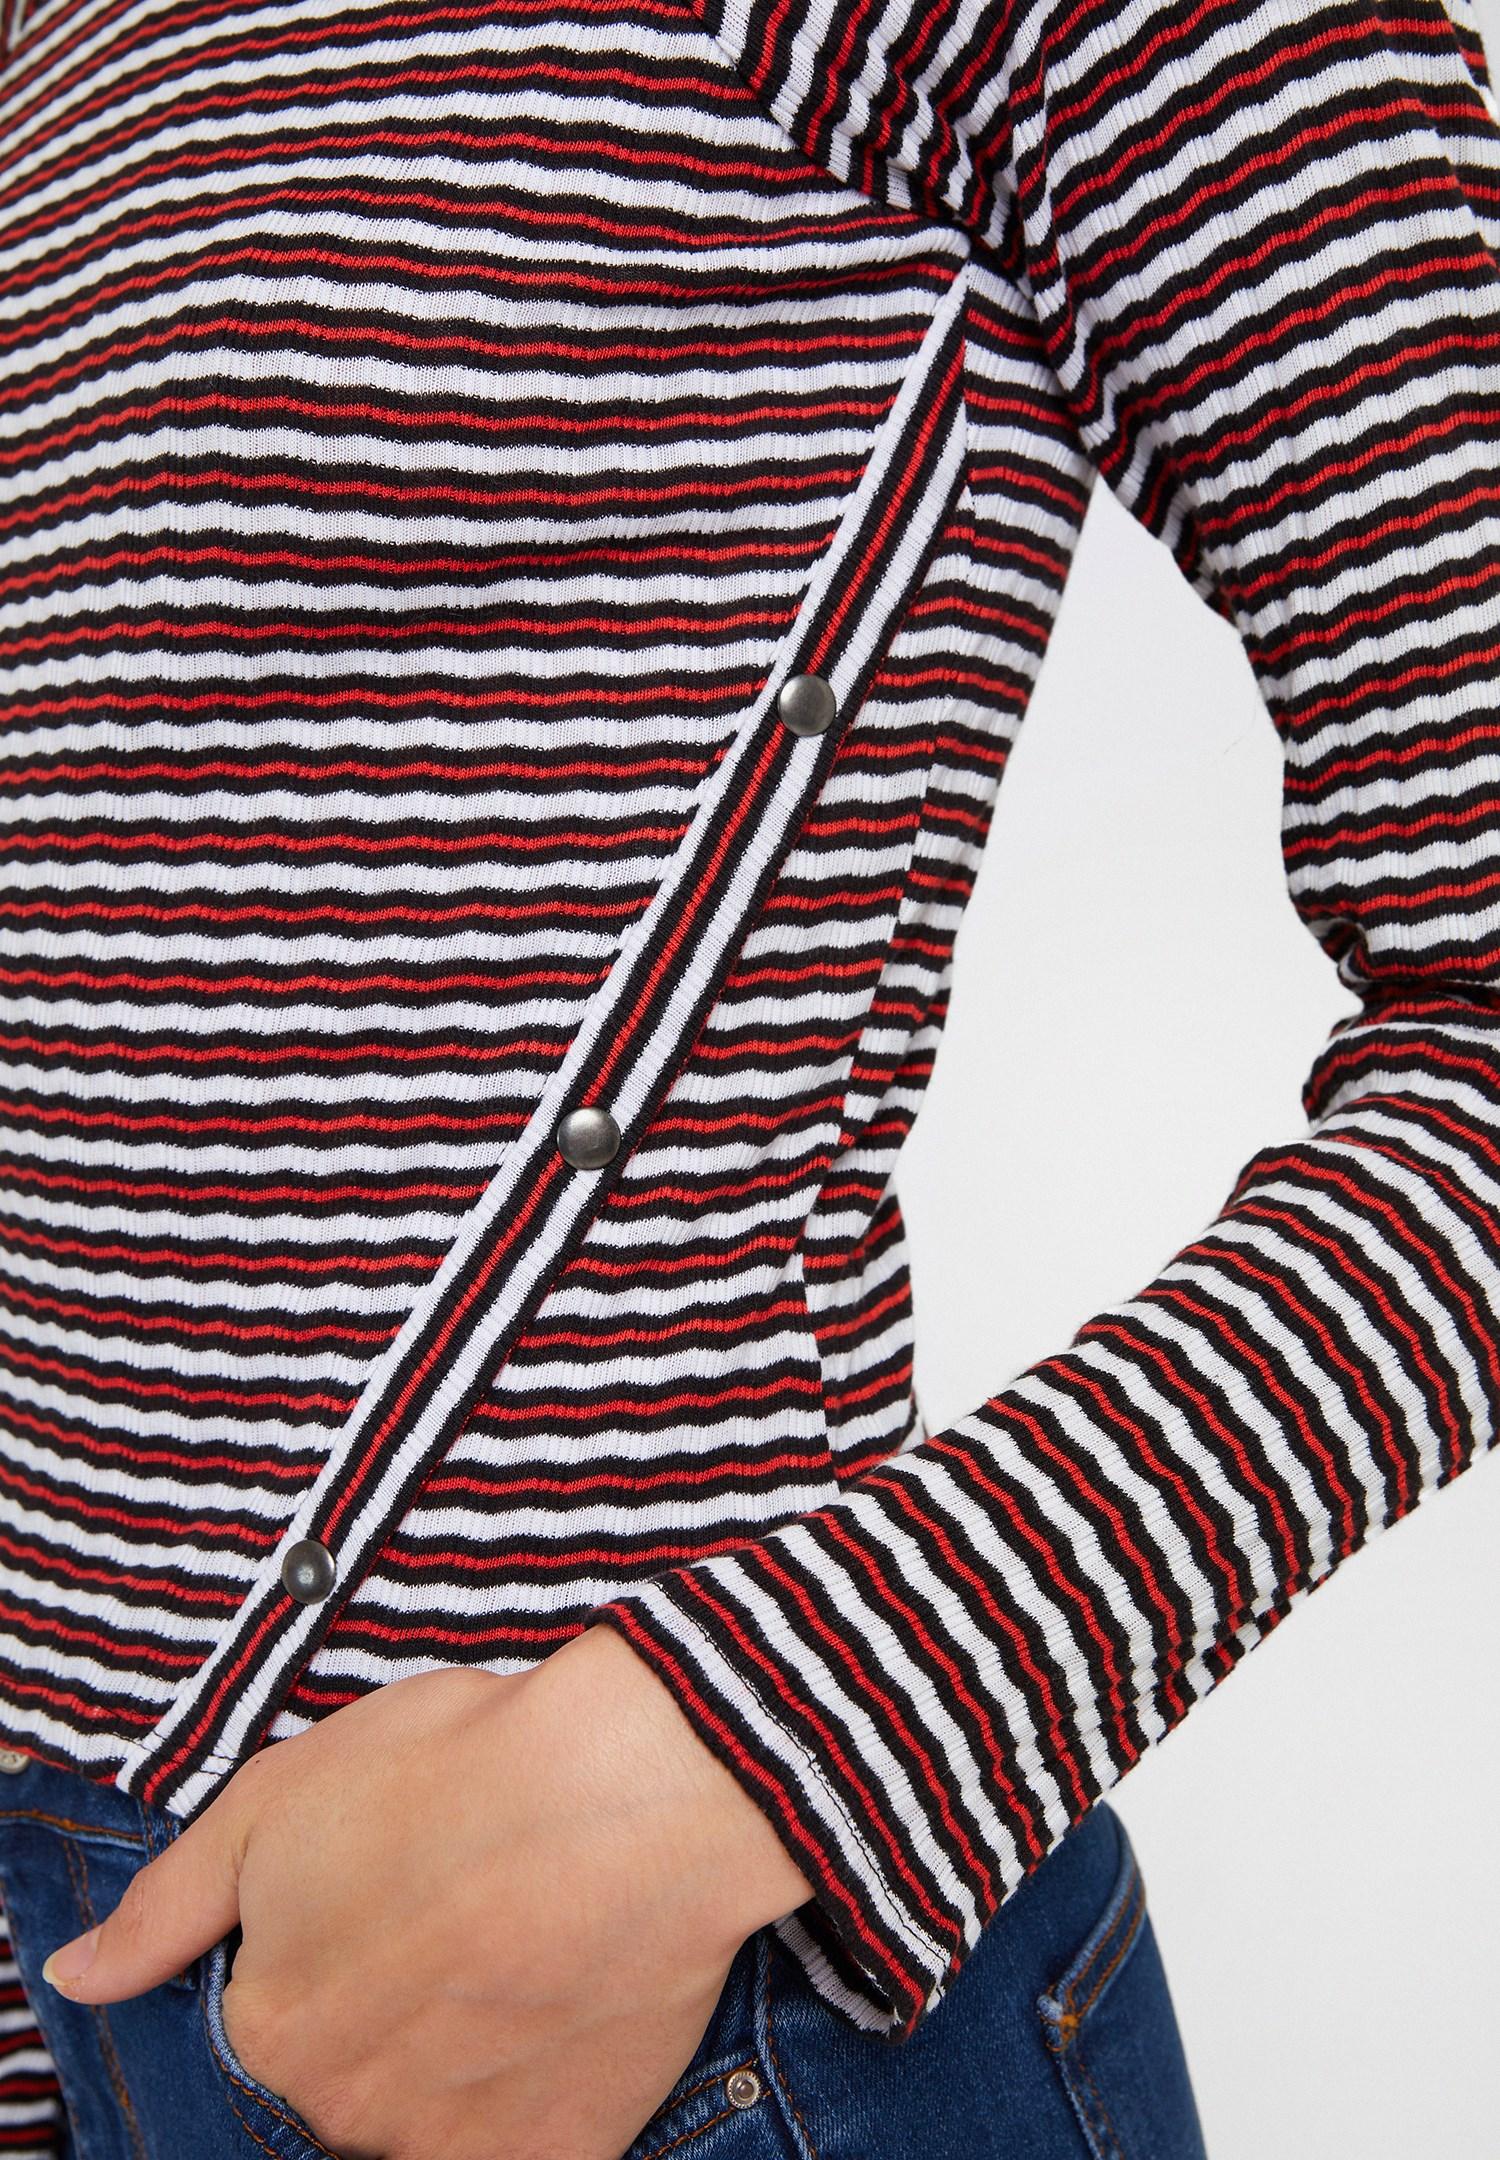 Women Mixed Long Sleeve Striped Blouse